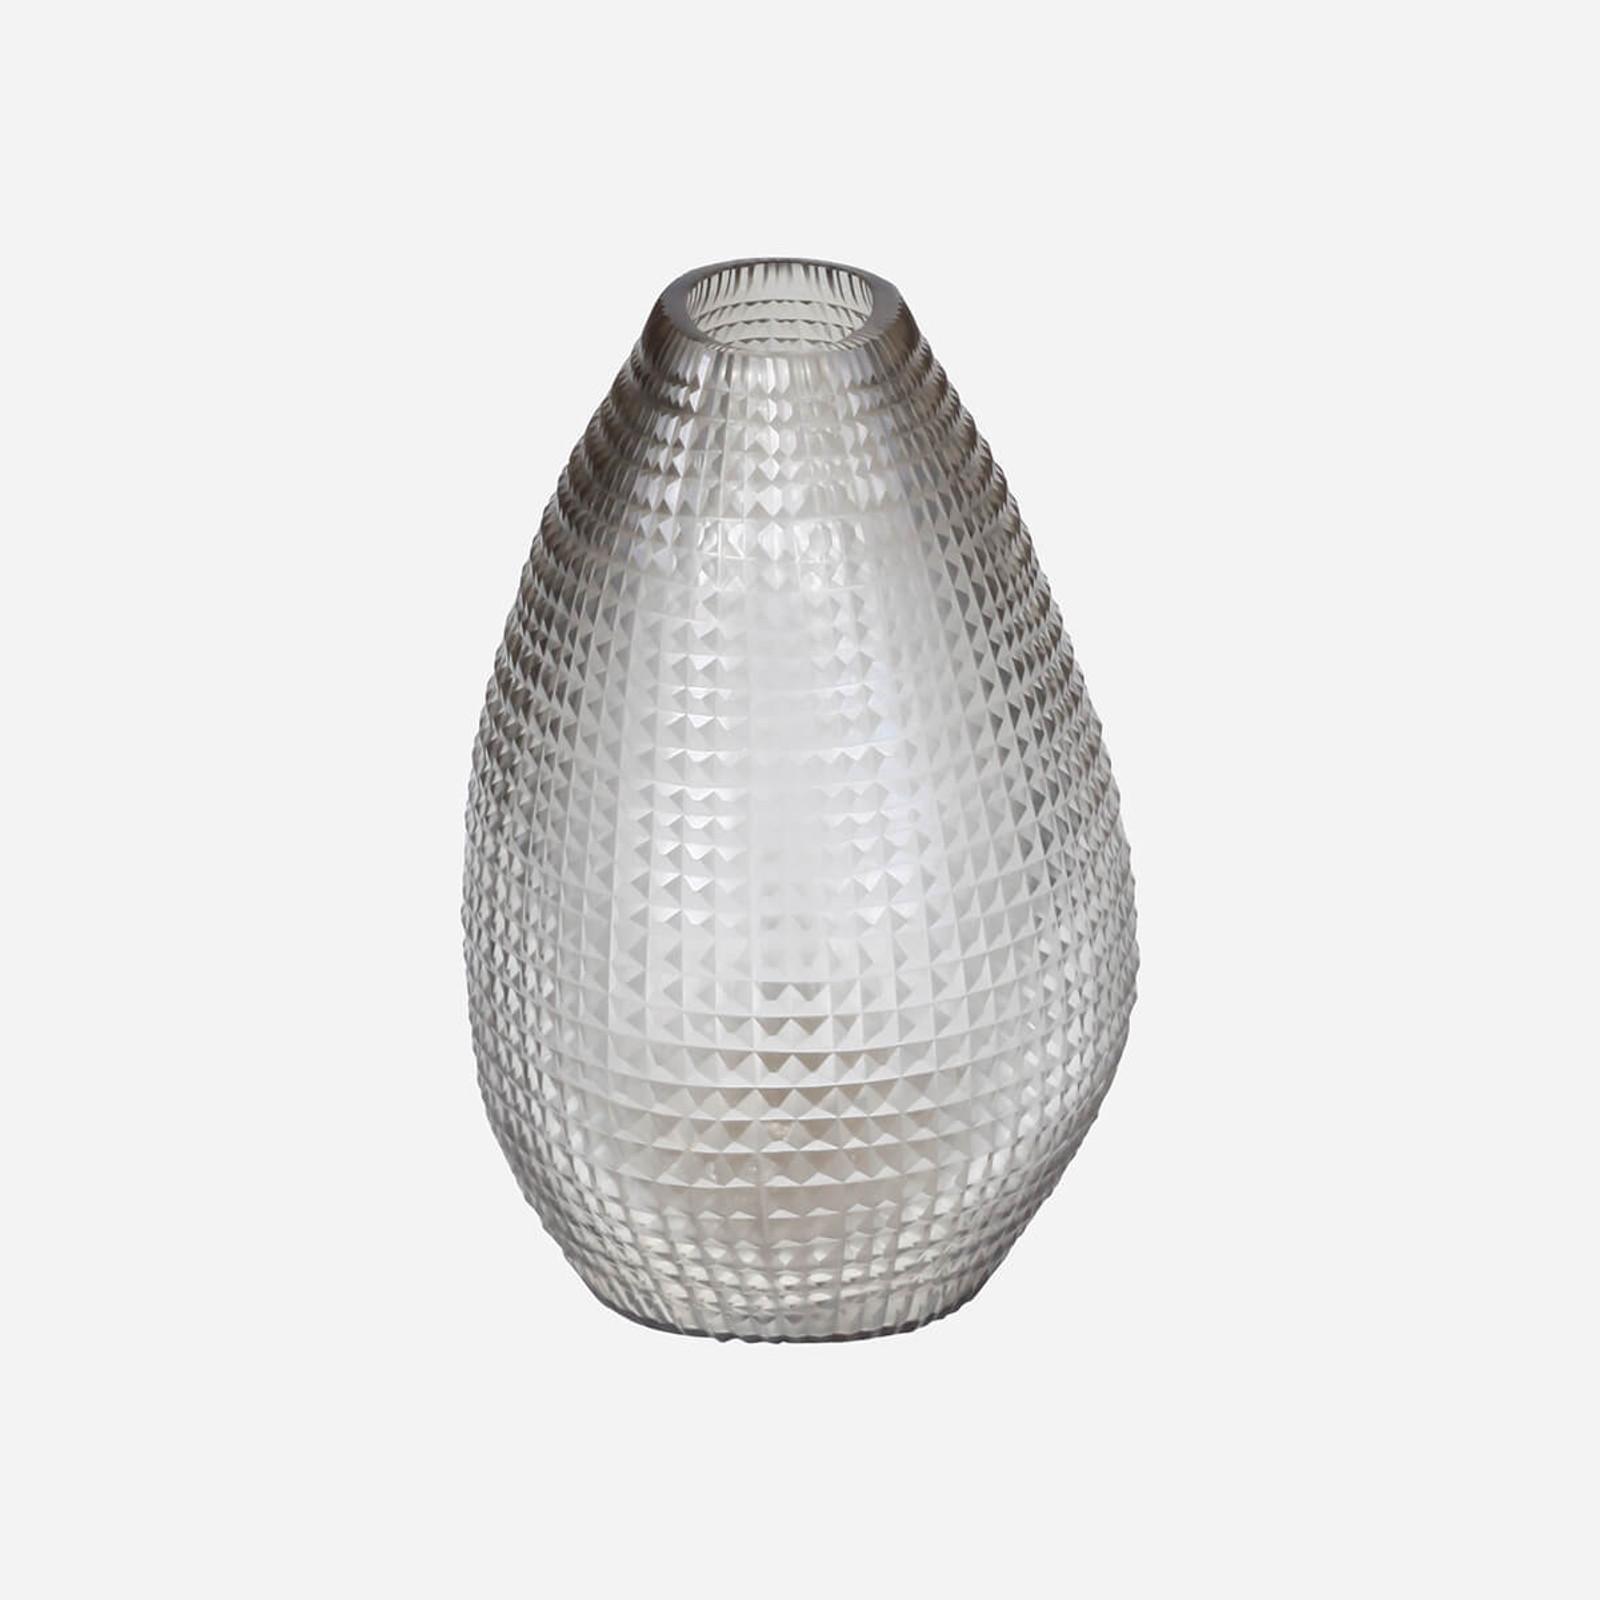 Somme Tall Vase, Jack Fruit Smoke